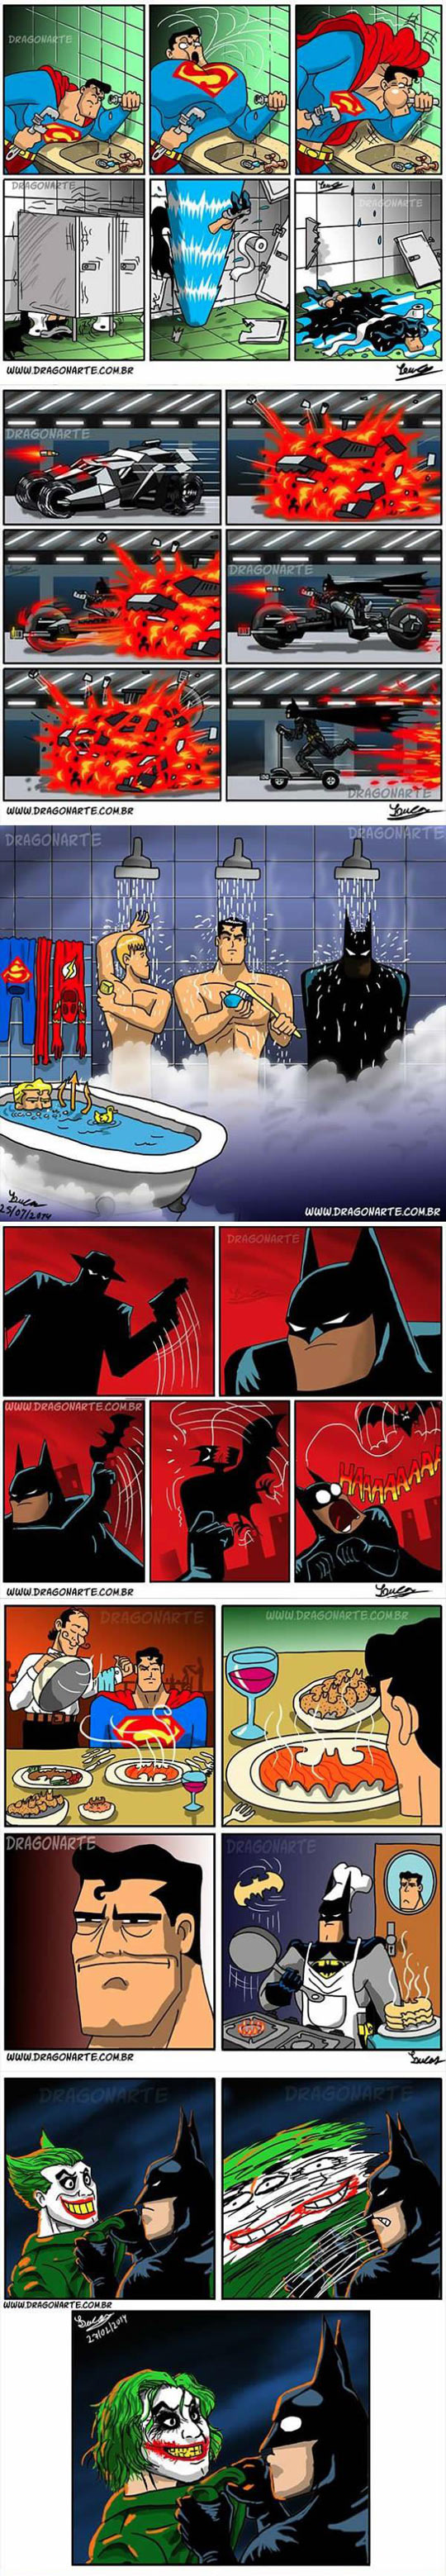 Funniest Batman Comics Collection